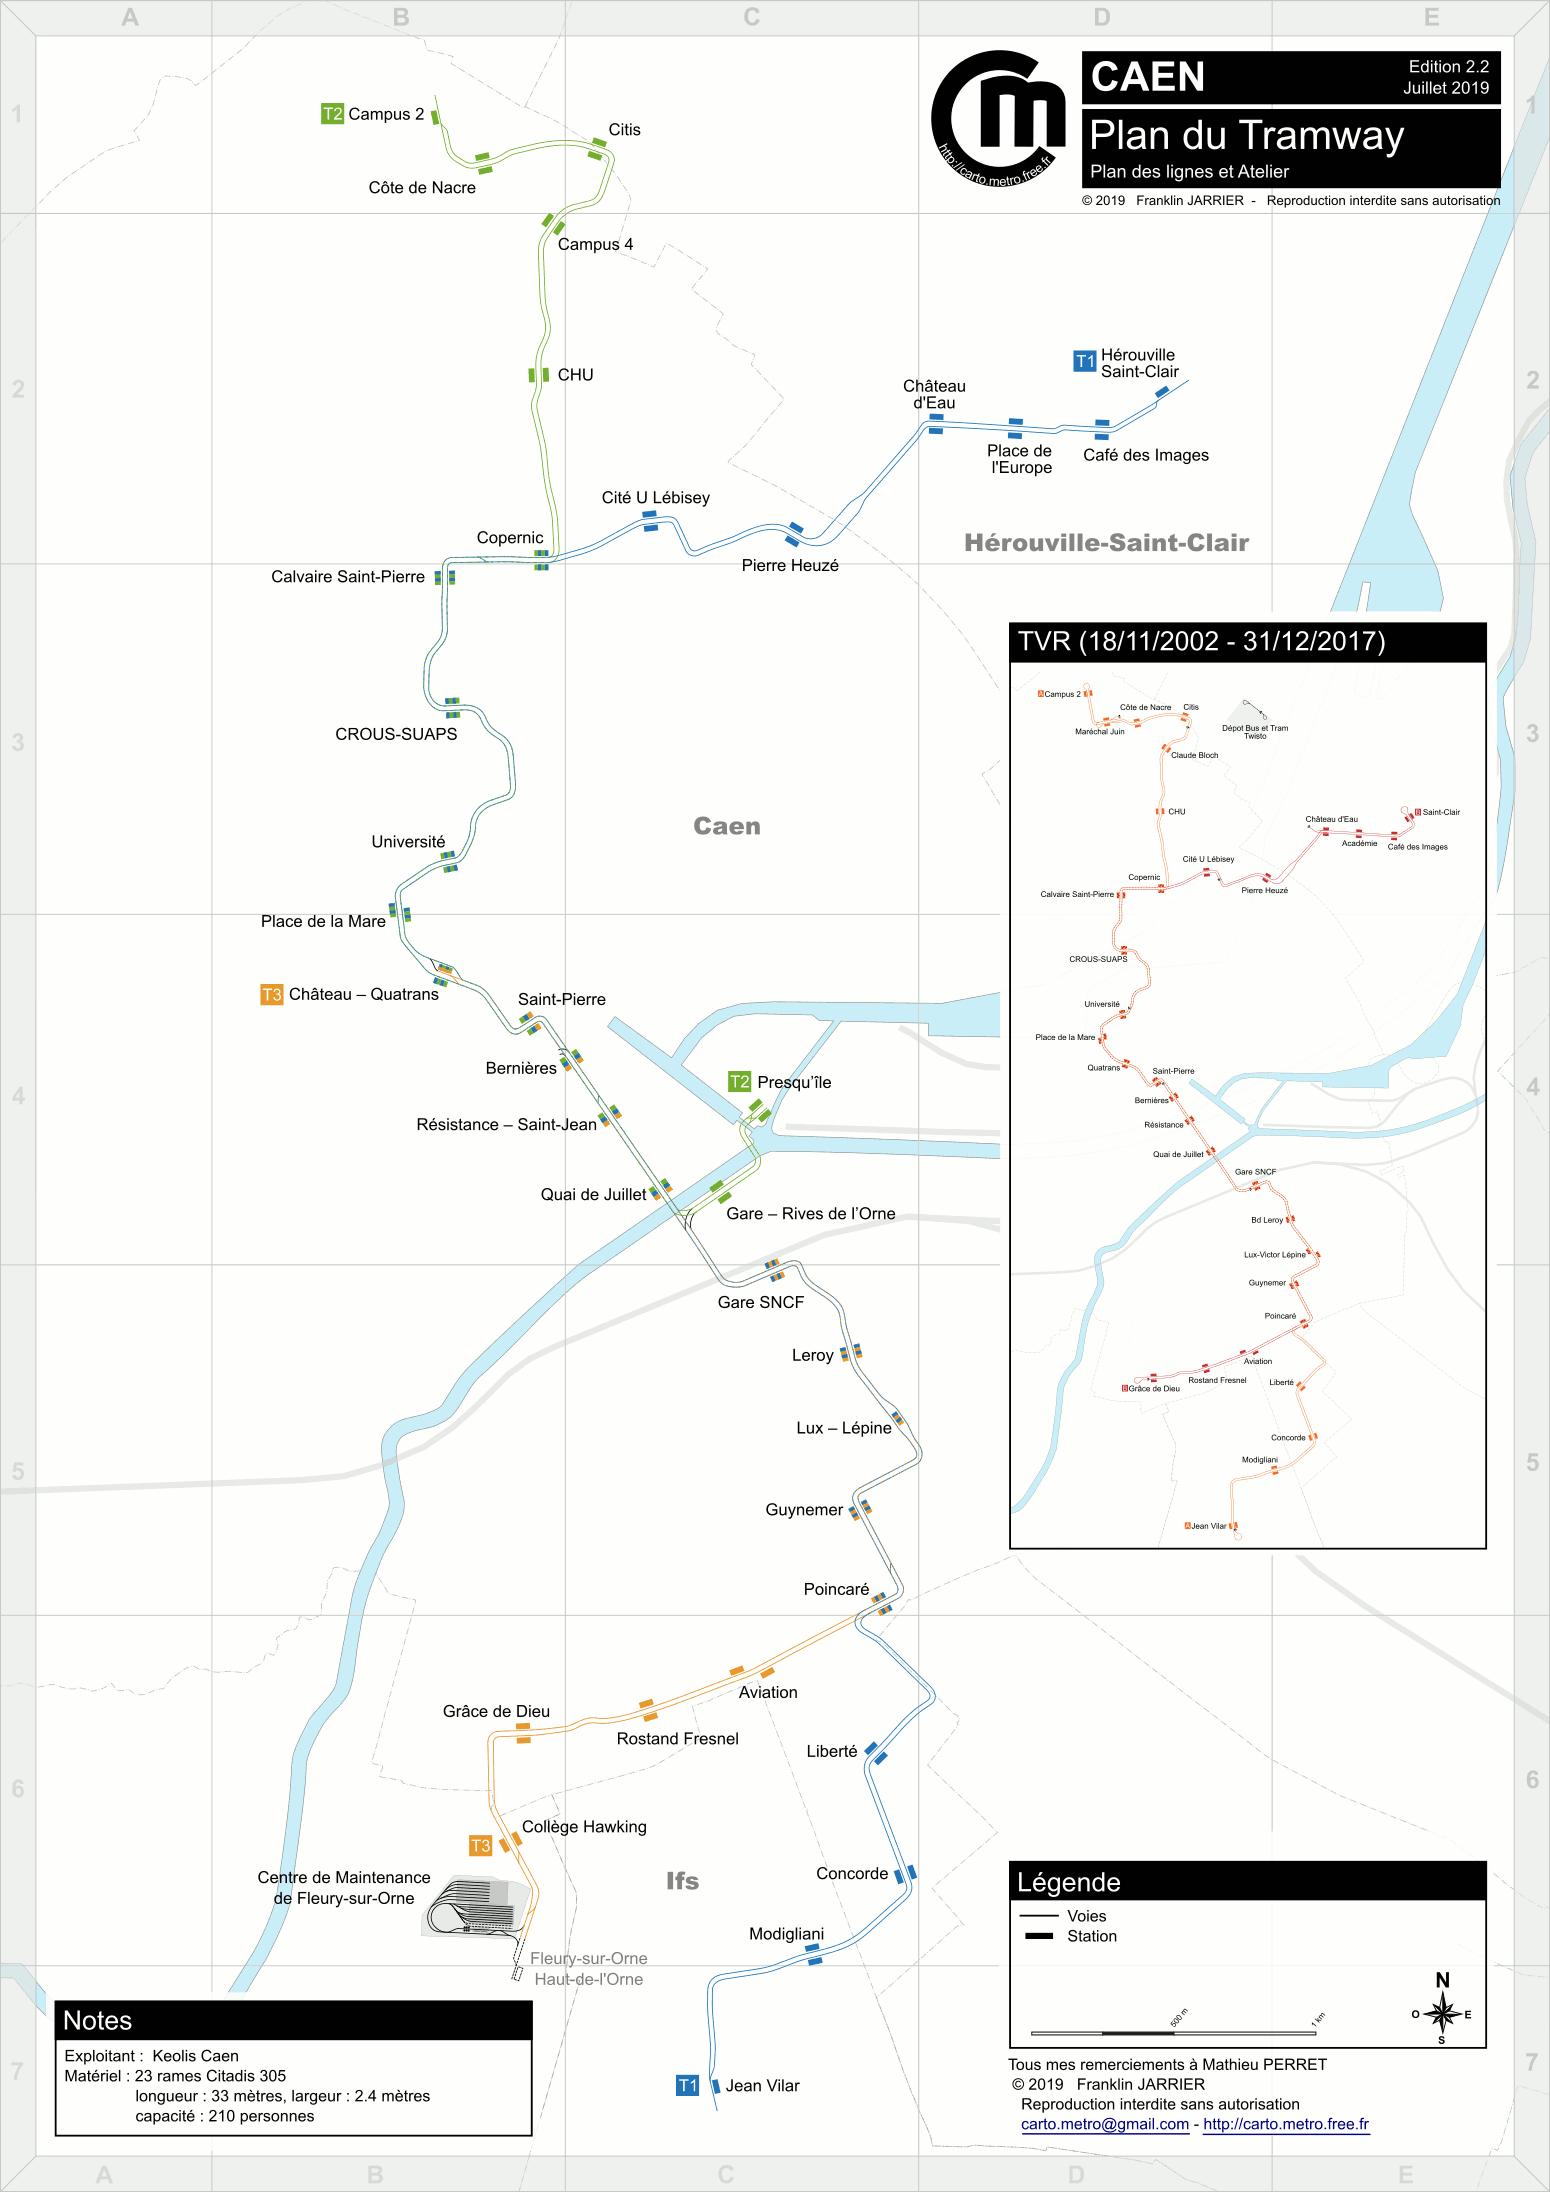 Subway Map Lisbon Pdf.Detailled Tracks Map Paris Lyon Lausanne Milan Turin Tracks Maps